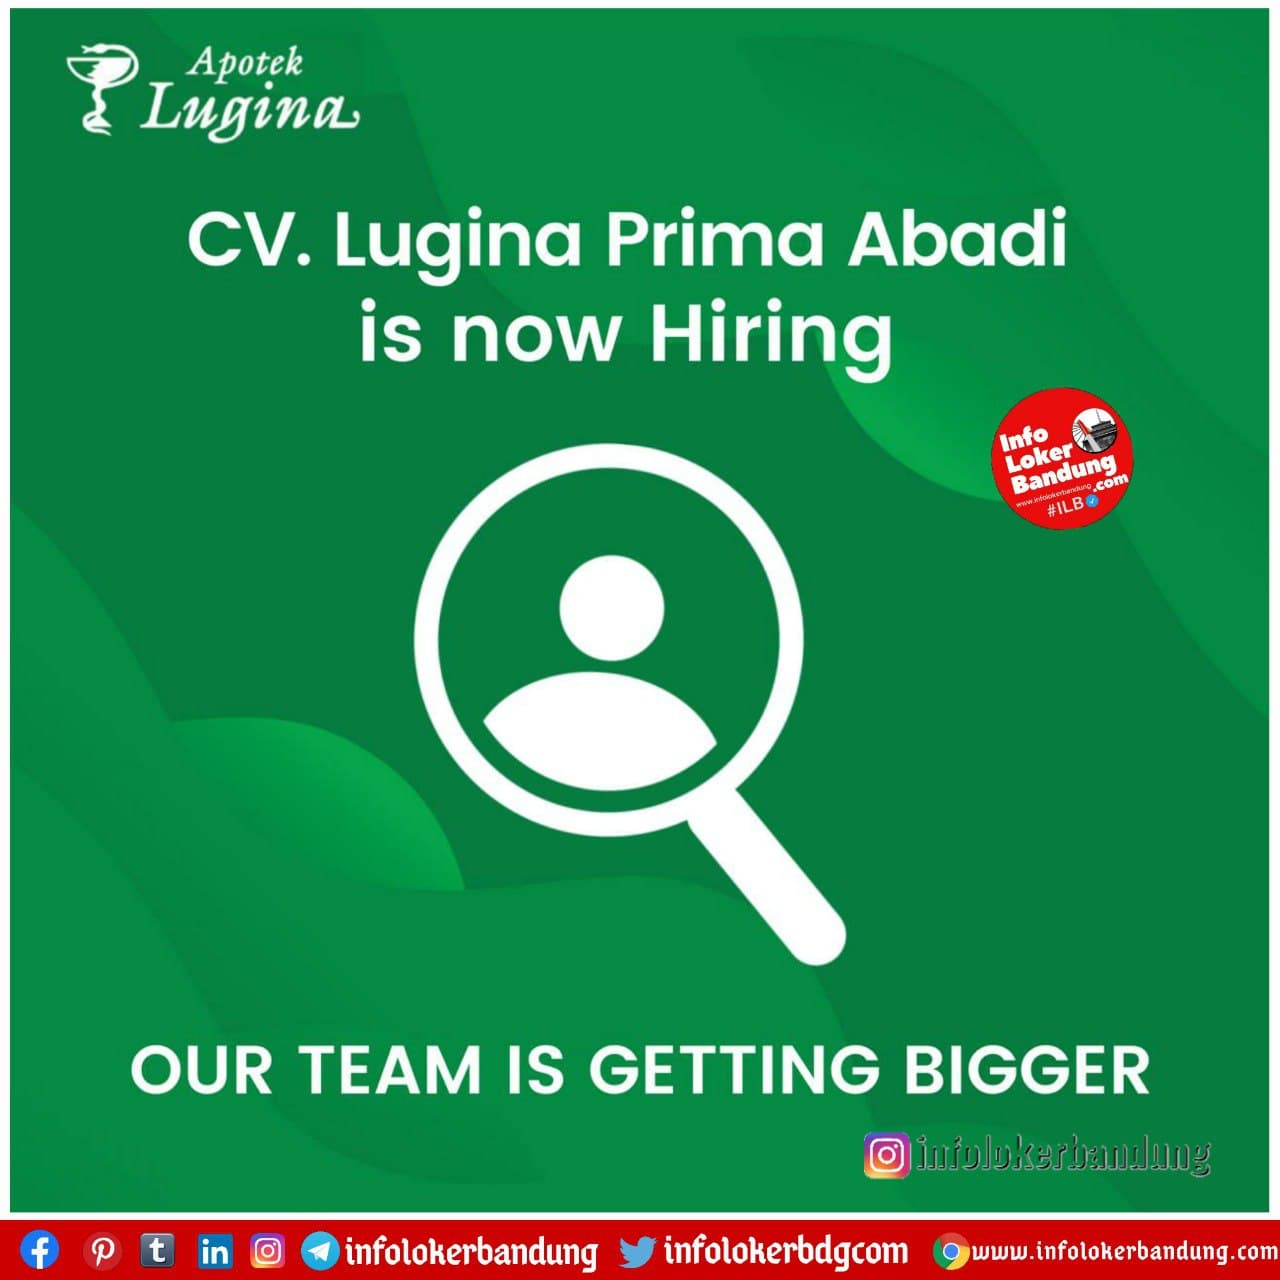 Lowongan Kerja CV. Lugina Prima Abadi Bandung Januari 2021